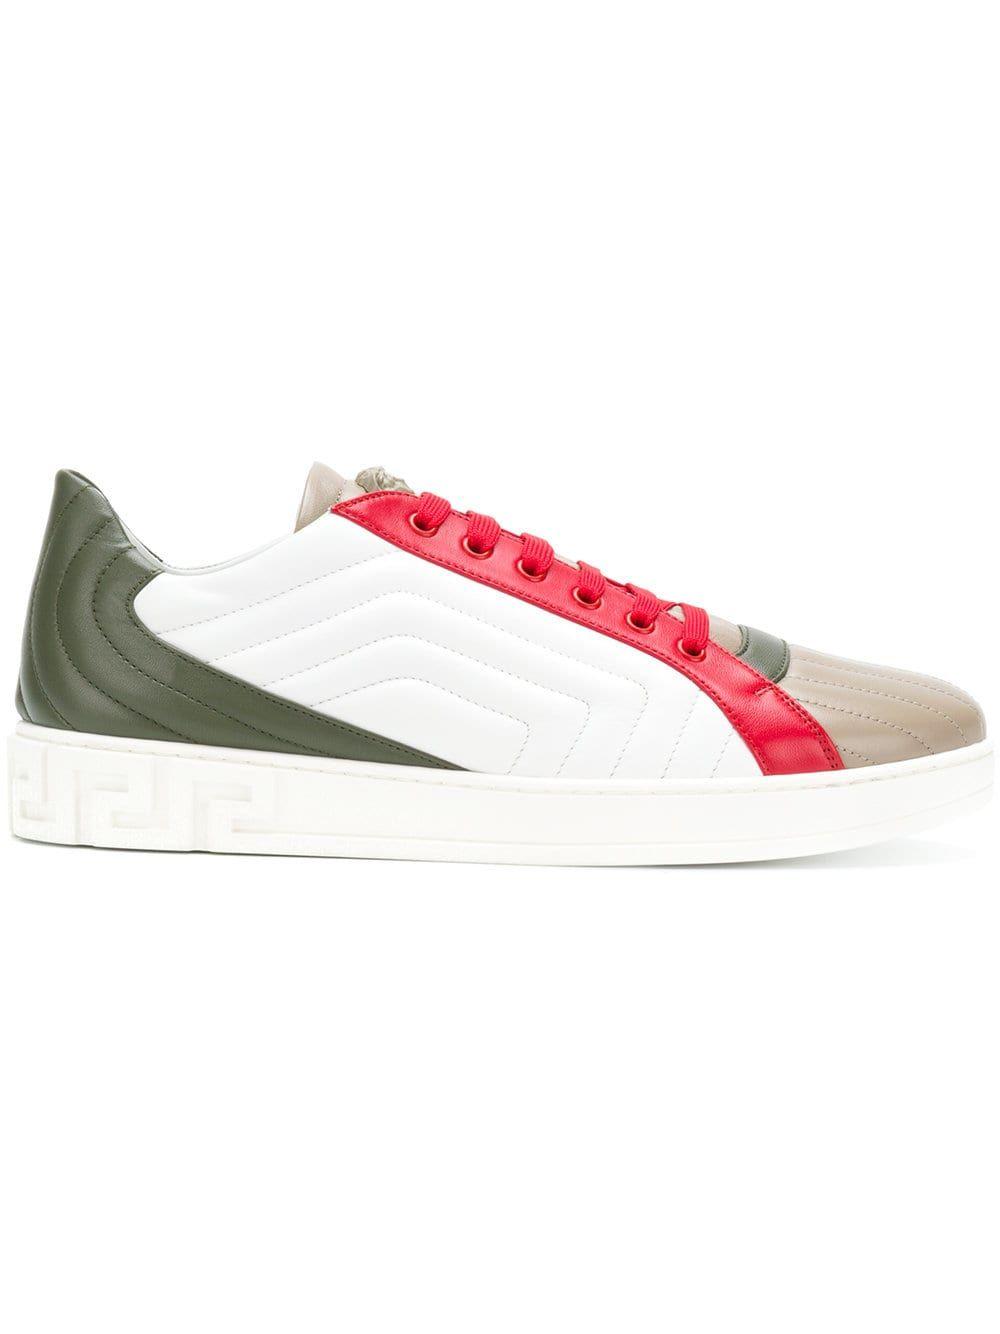 MulticolourMy En Versace Colour Top Block Sneakers Low eHIWDE2b9Y